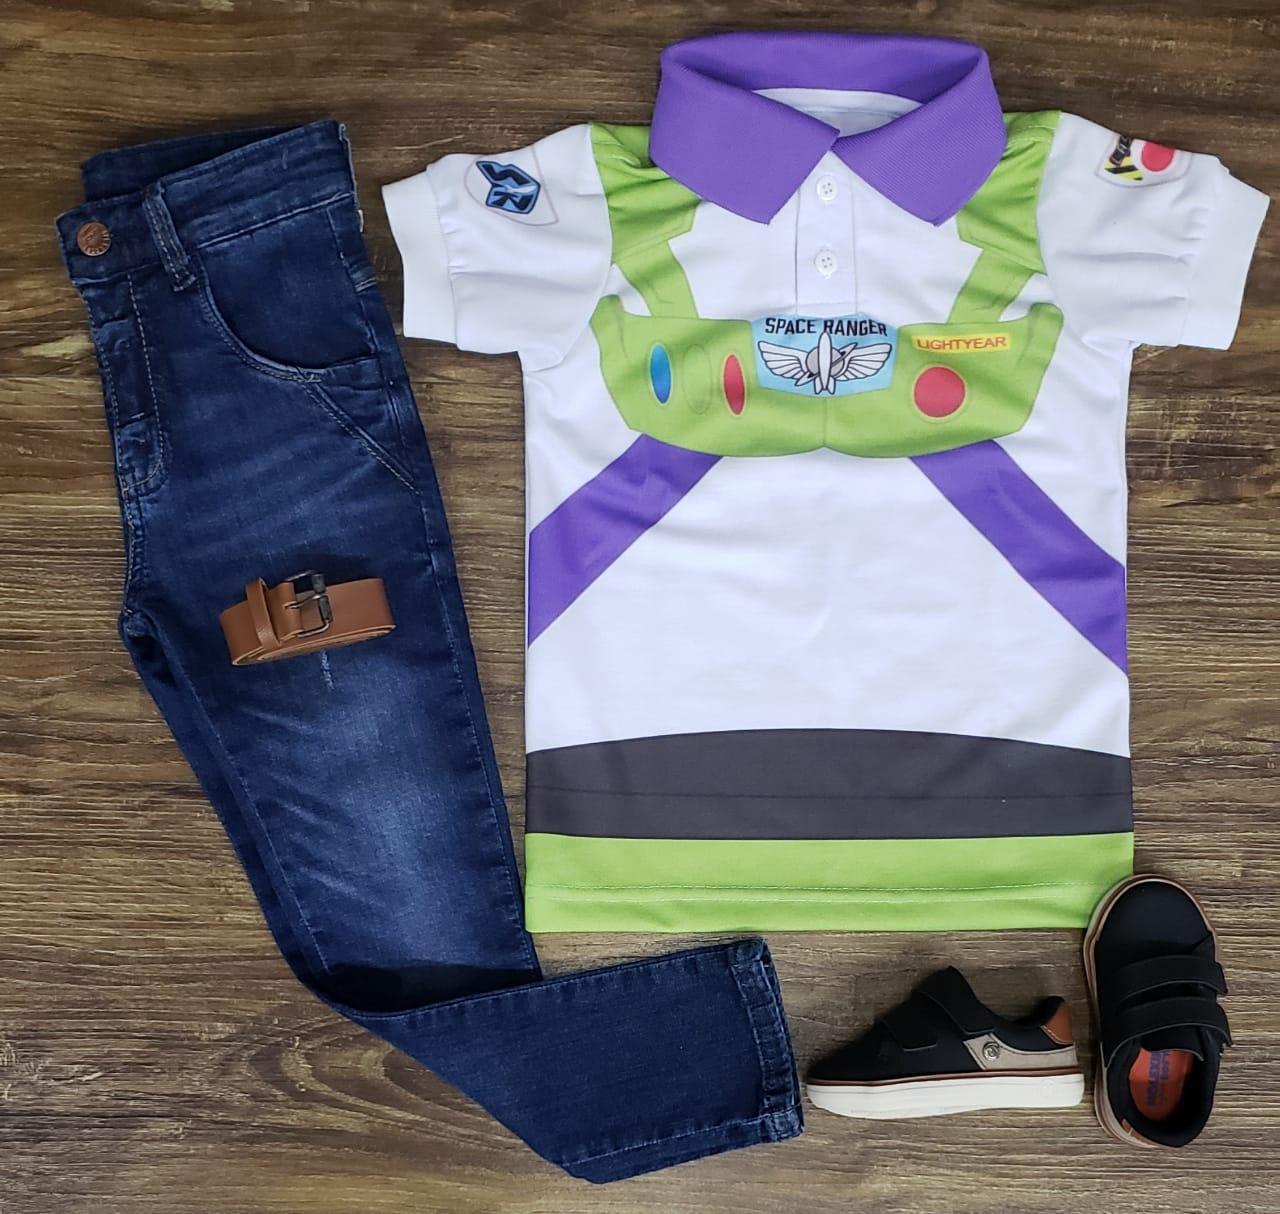 Calça Jeans com Polo Buzz Lightyear - Toy Story